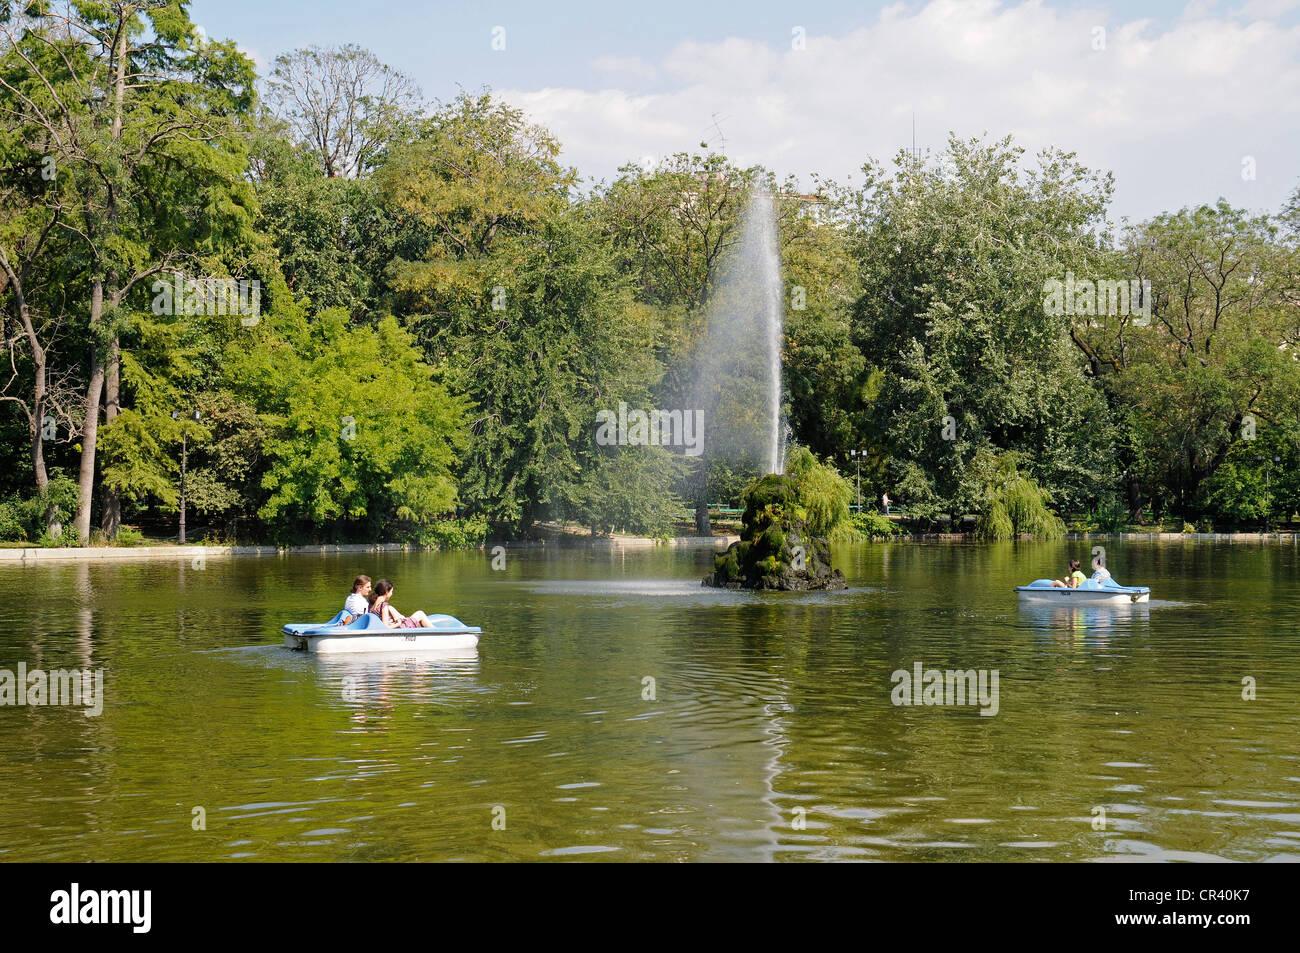 Pedal boats, lake, Cișmigiu Gardens, Bucharest, Romania, Eastern Europe, Europe, PublicGround - Stock Image